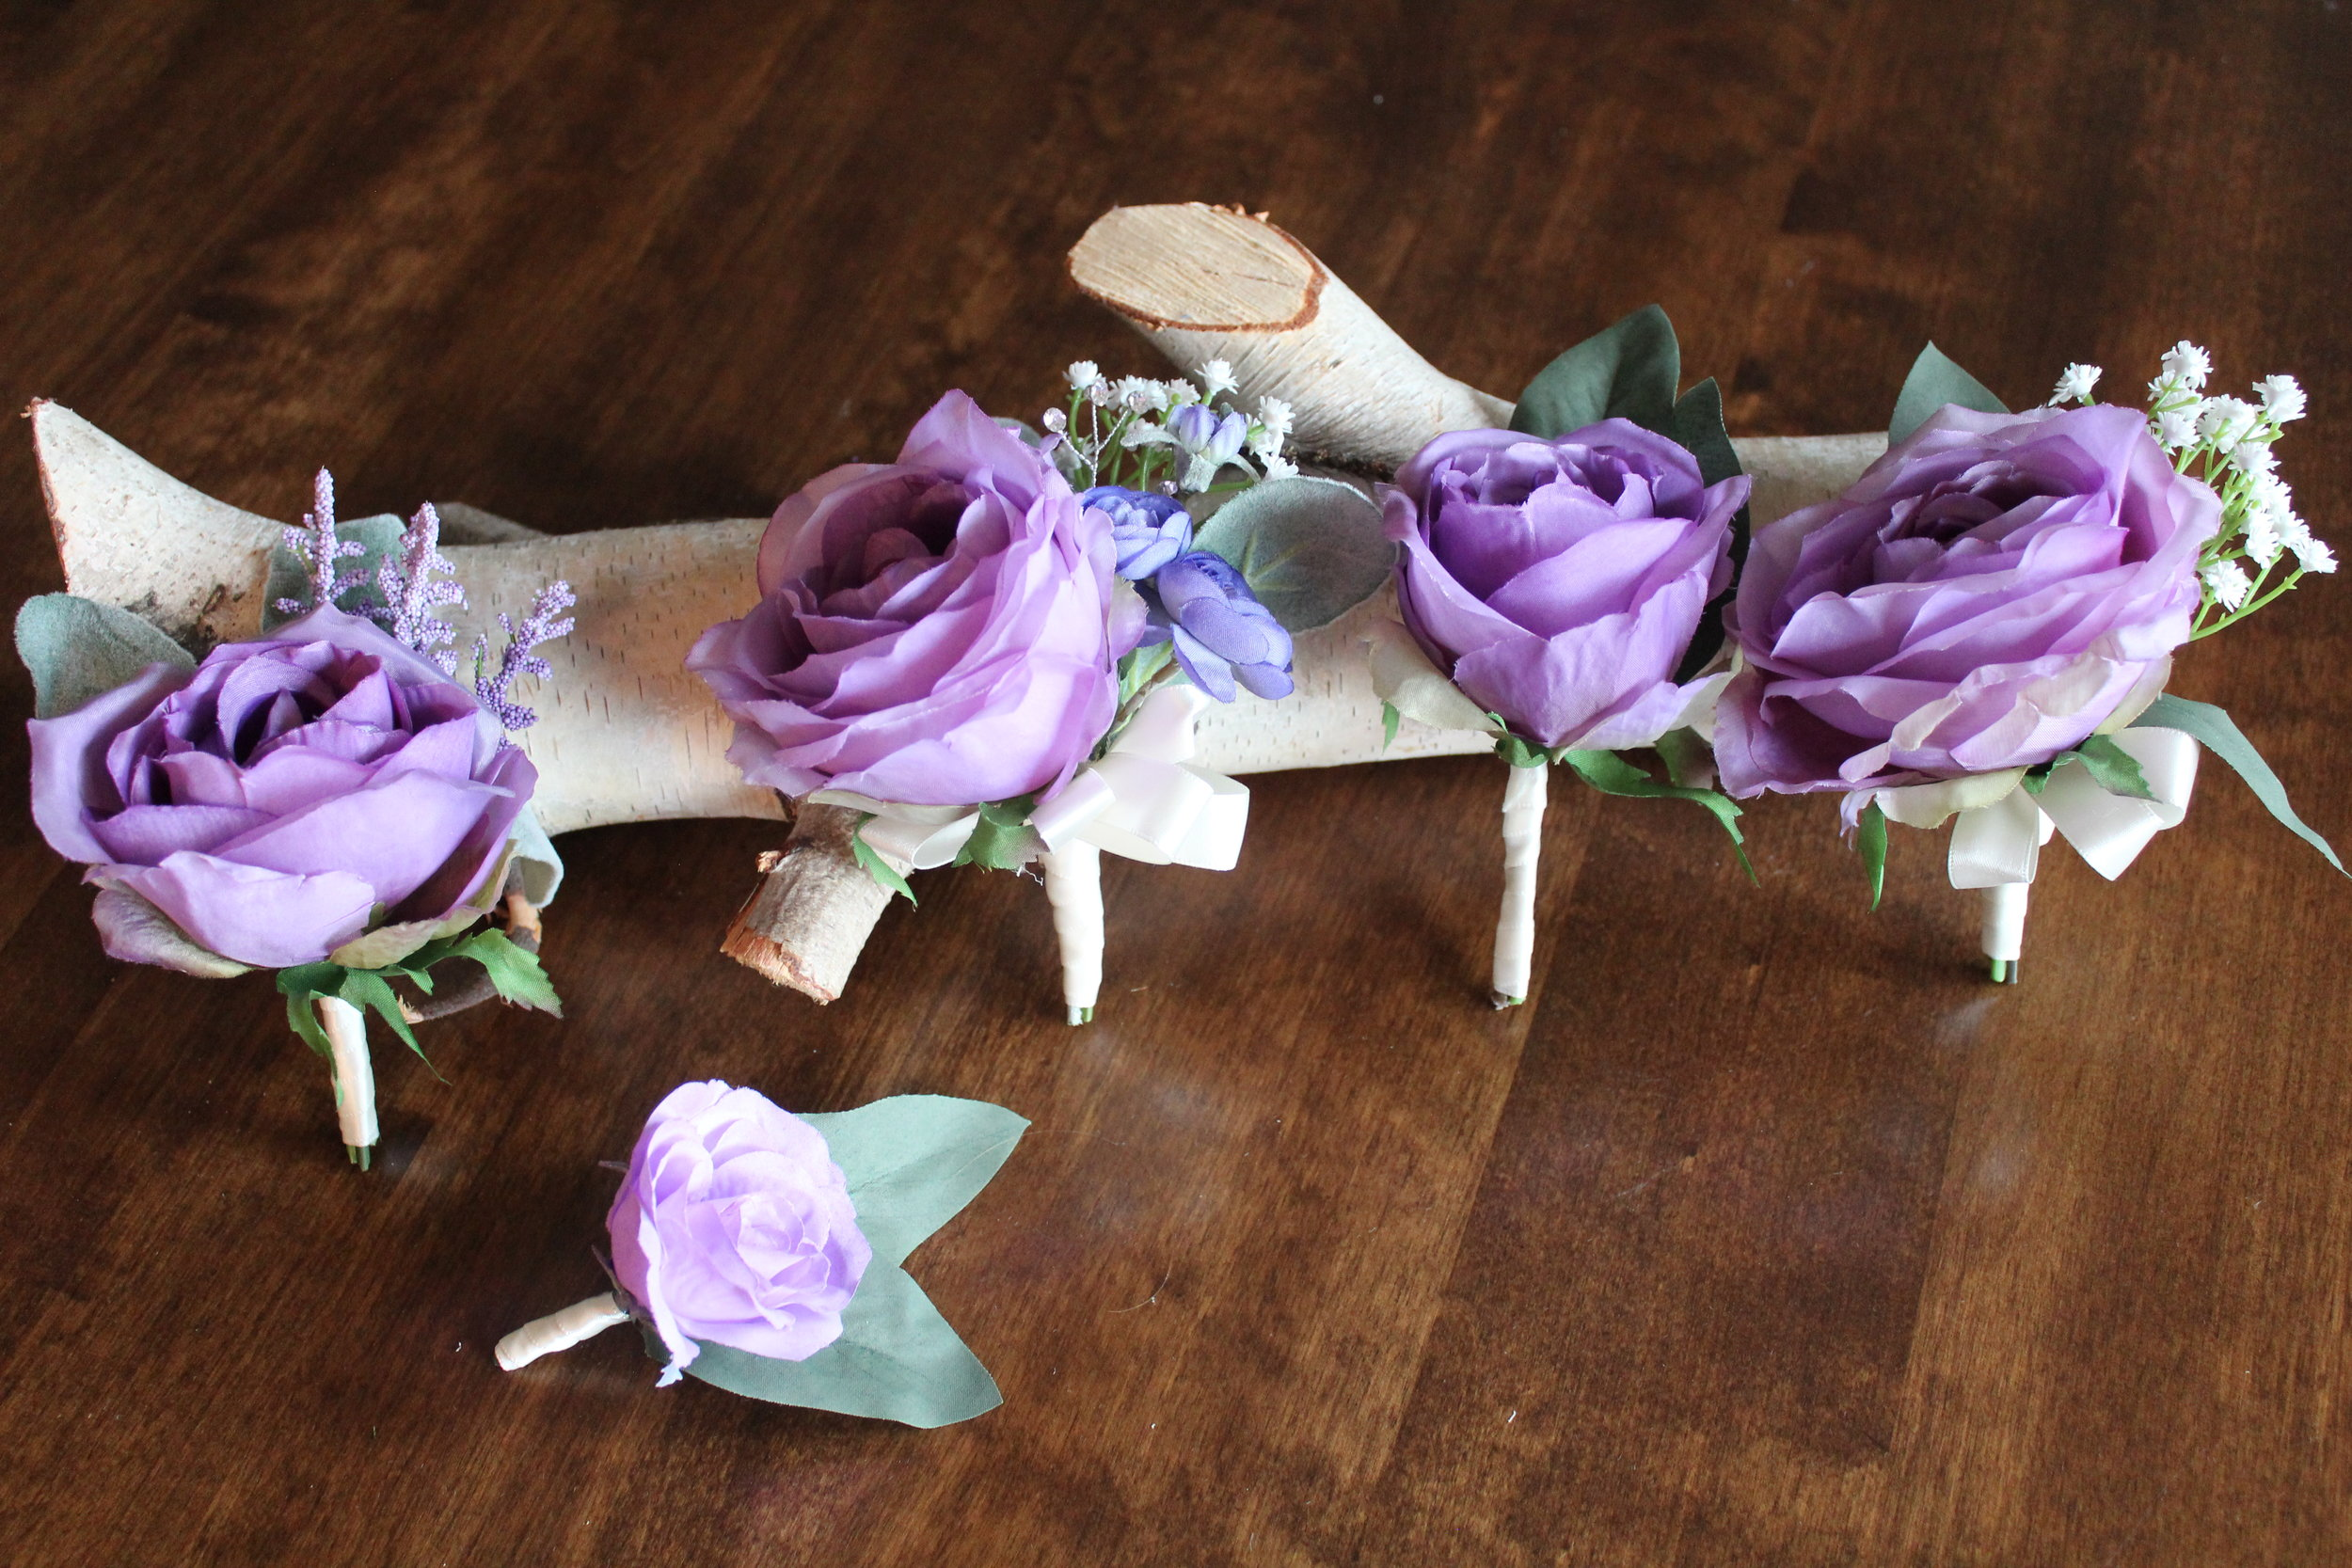 custom-silk-wedding-flowers-bridal-bouquet-boutonnieres.jpg